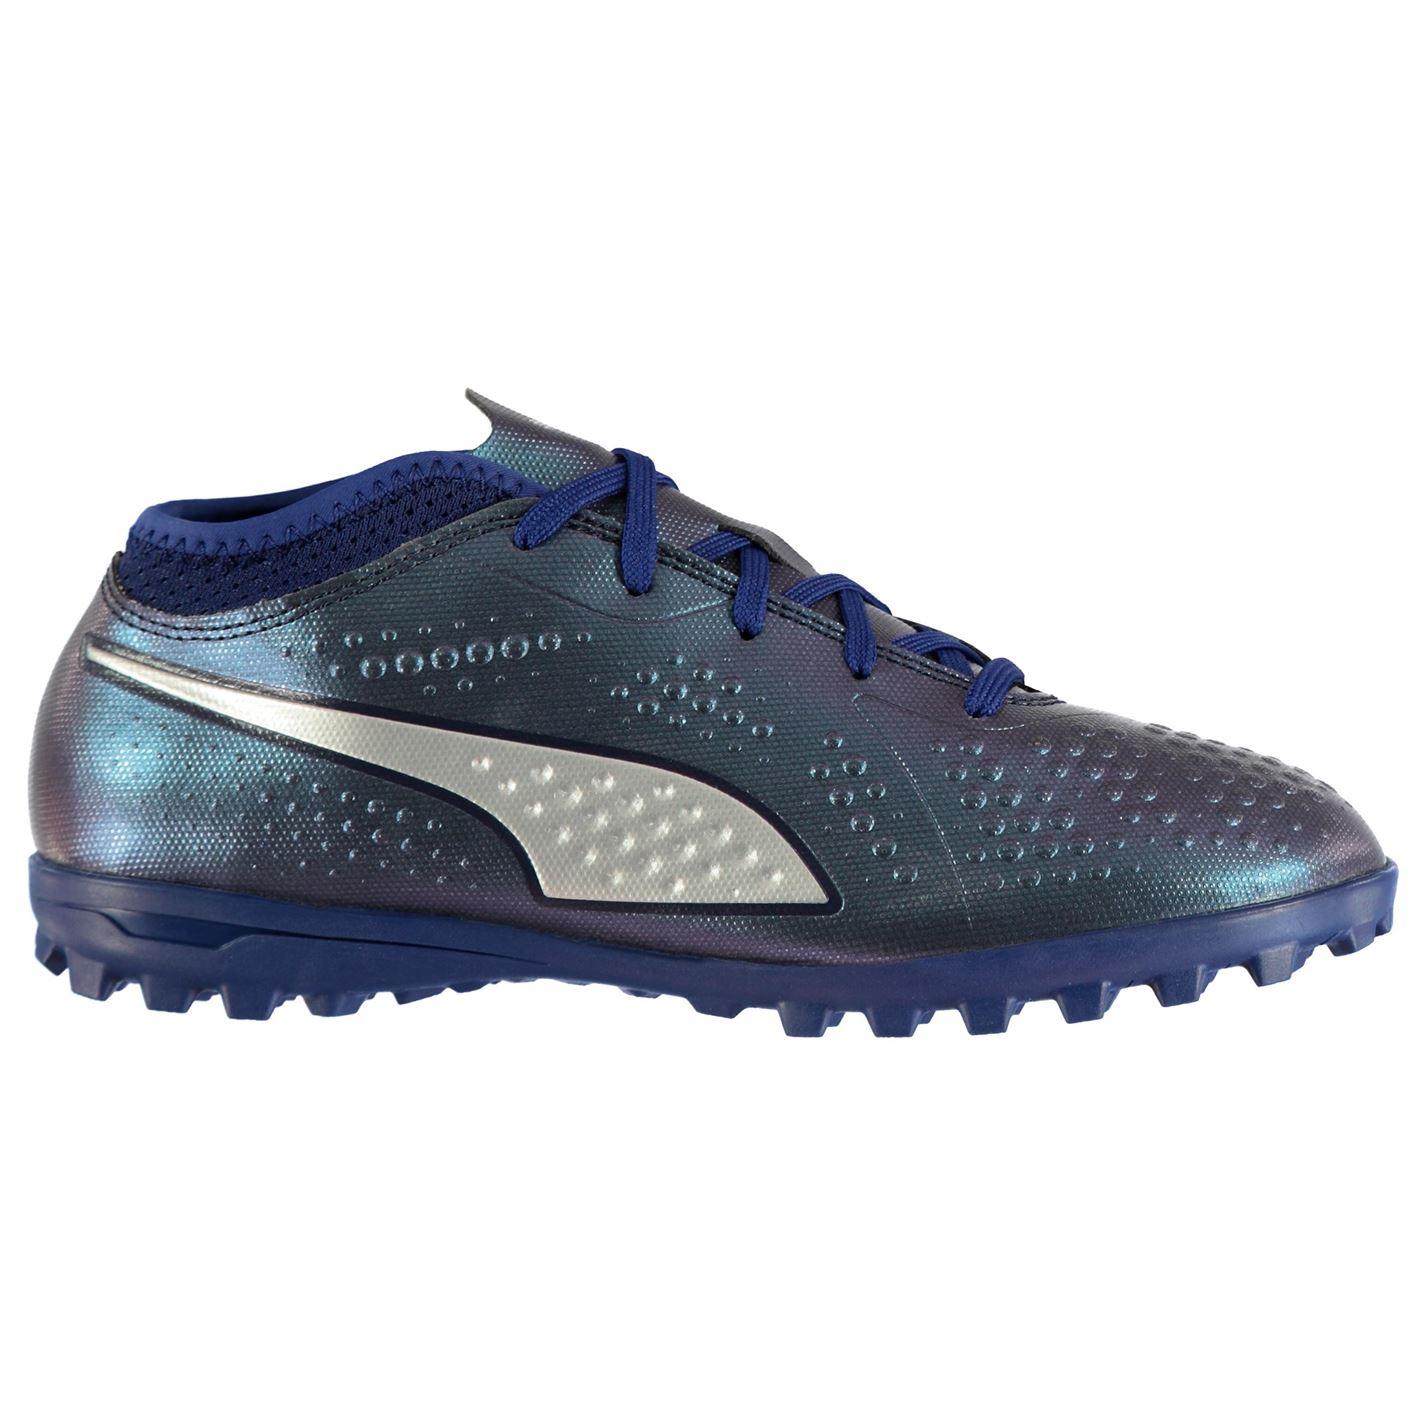 c8a1b29f38 boty Puma ONE 4 dětské Astro Turf